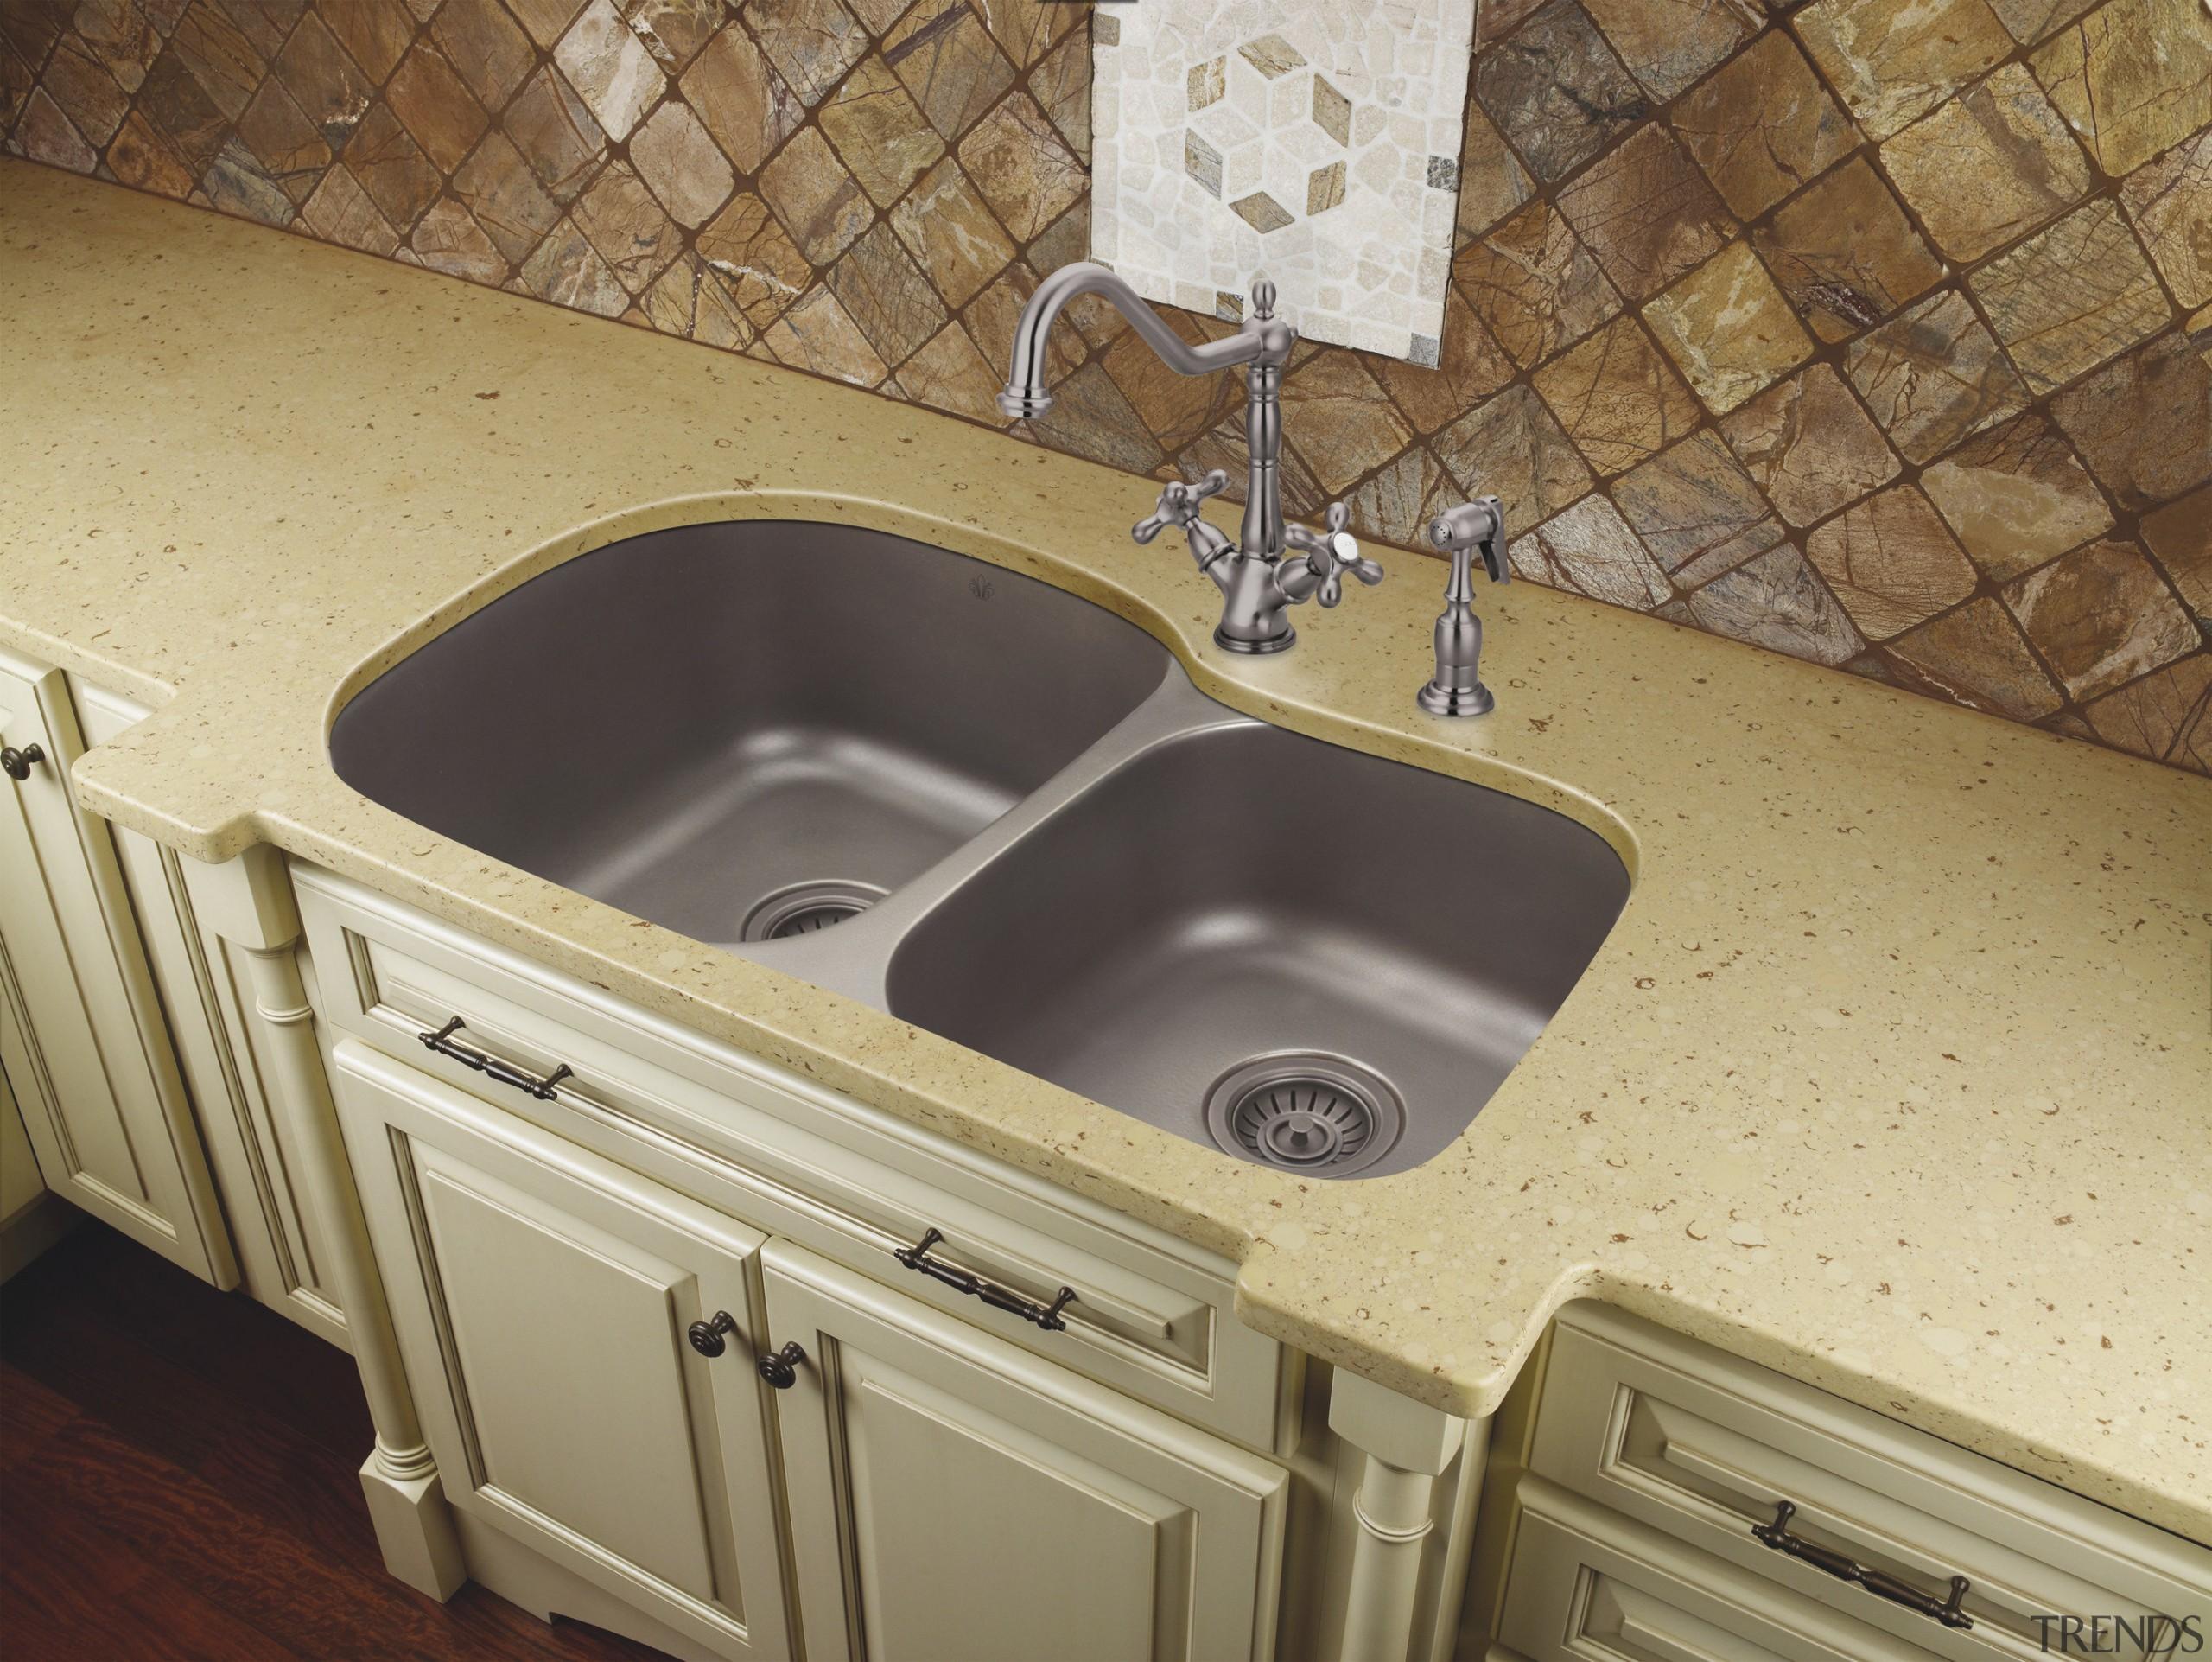 View of undermounted double sinks by Artisan Manufacturing bathroom, bathroom sink, countertop, plumbing fixture, sink, tile, brown, orange